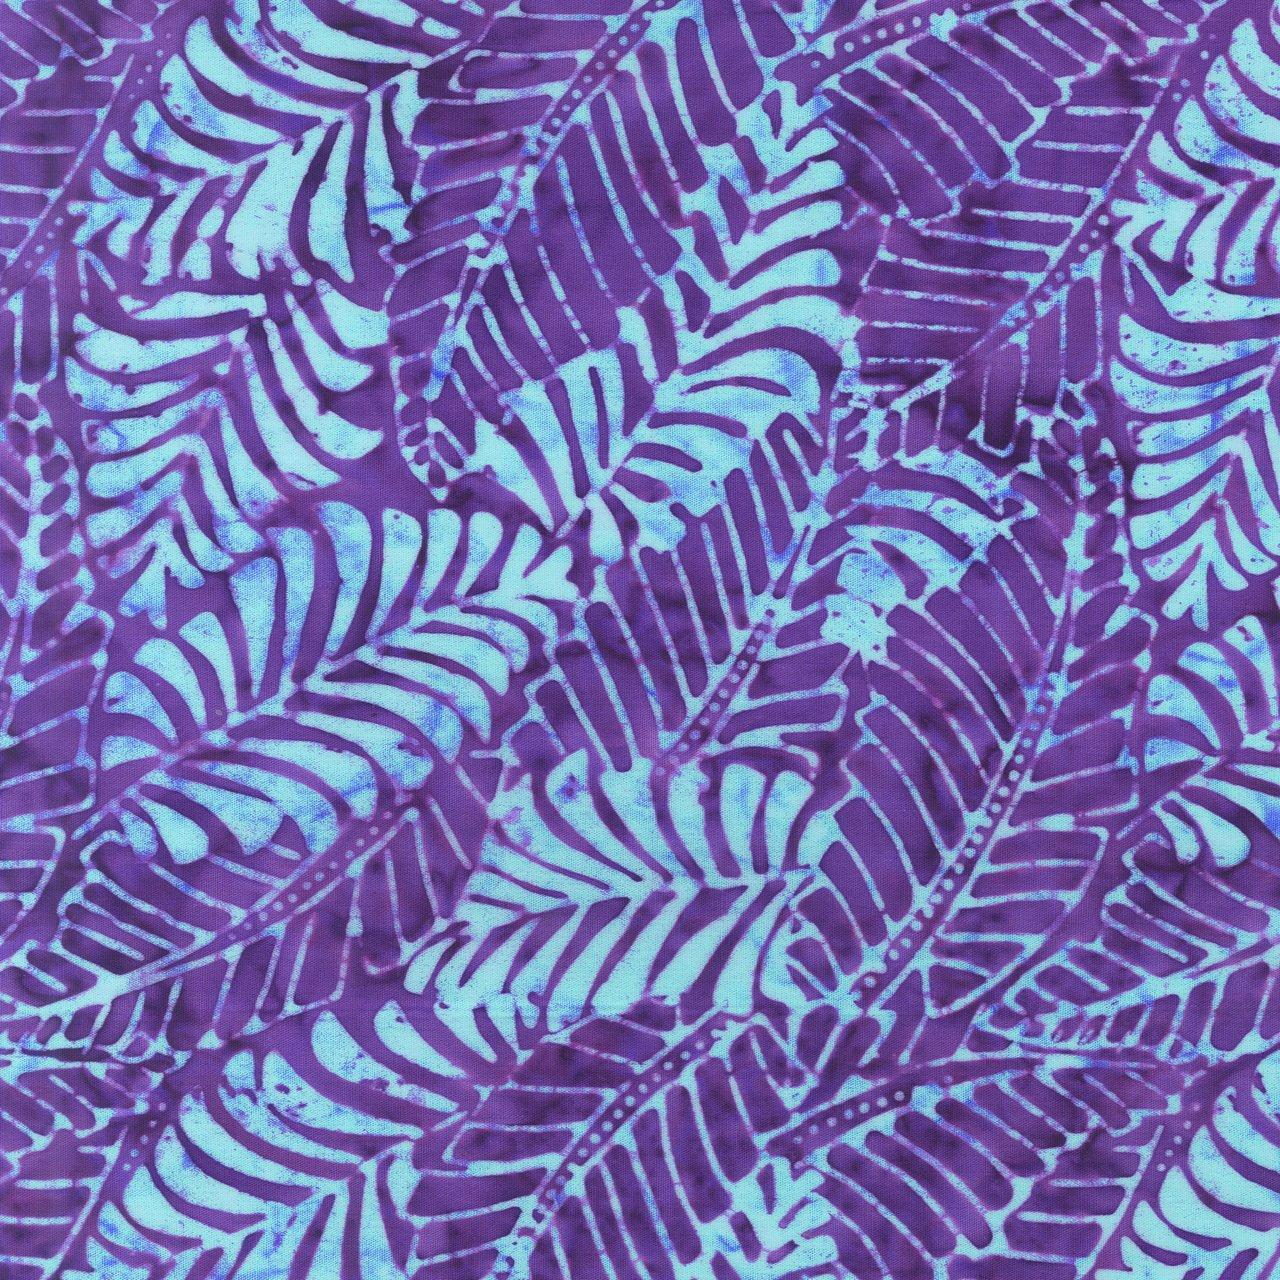 2050Q-X Art Inspired Light Iris, 1924 by Anthology Fabrics